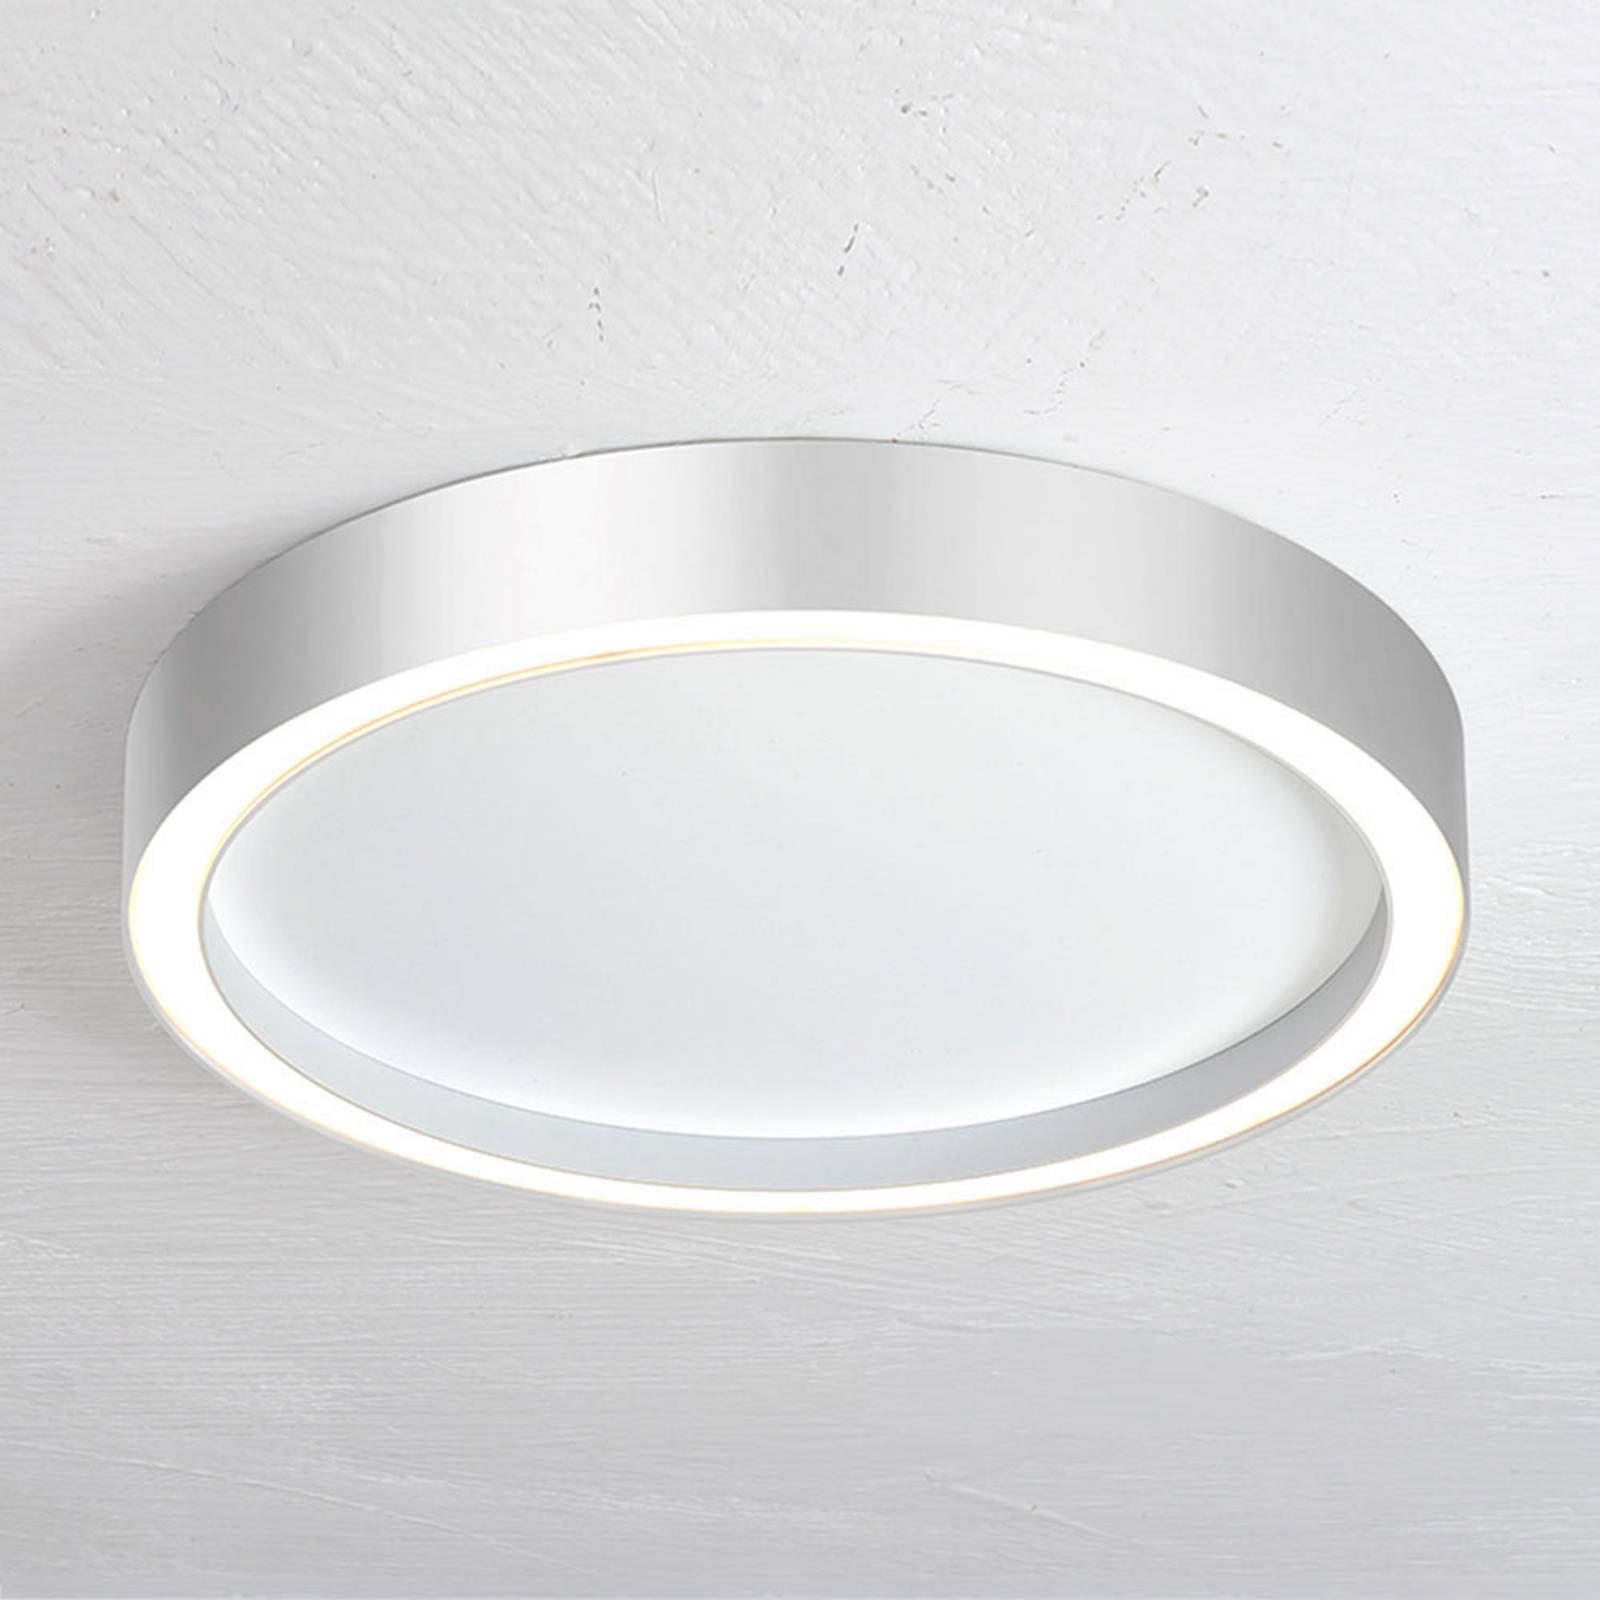 Bopp Aura LED-Deckenleuchte Ø 30cm weiß/aluminium